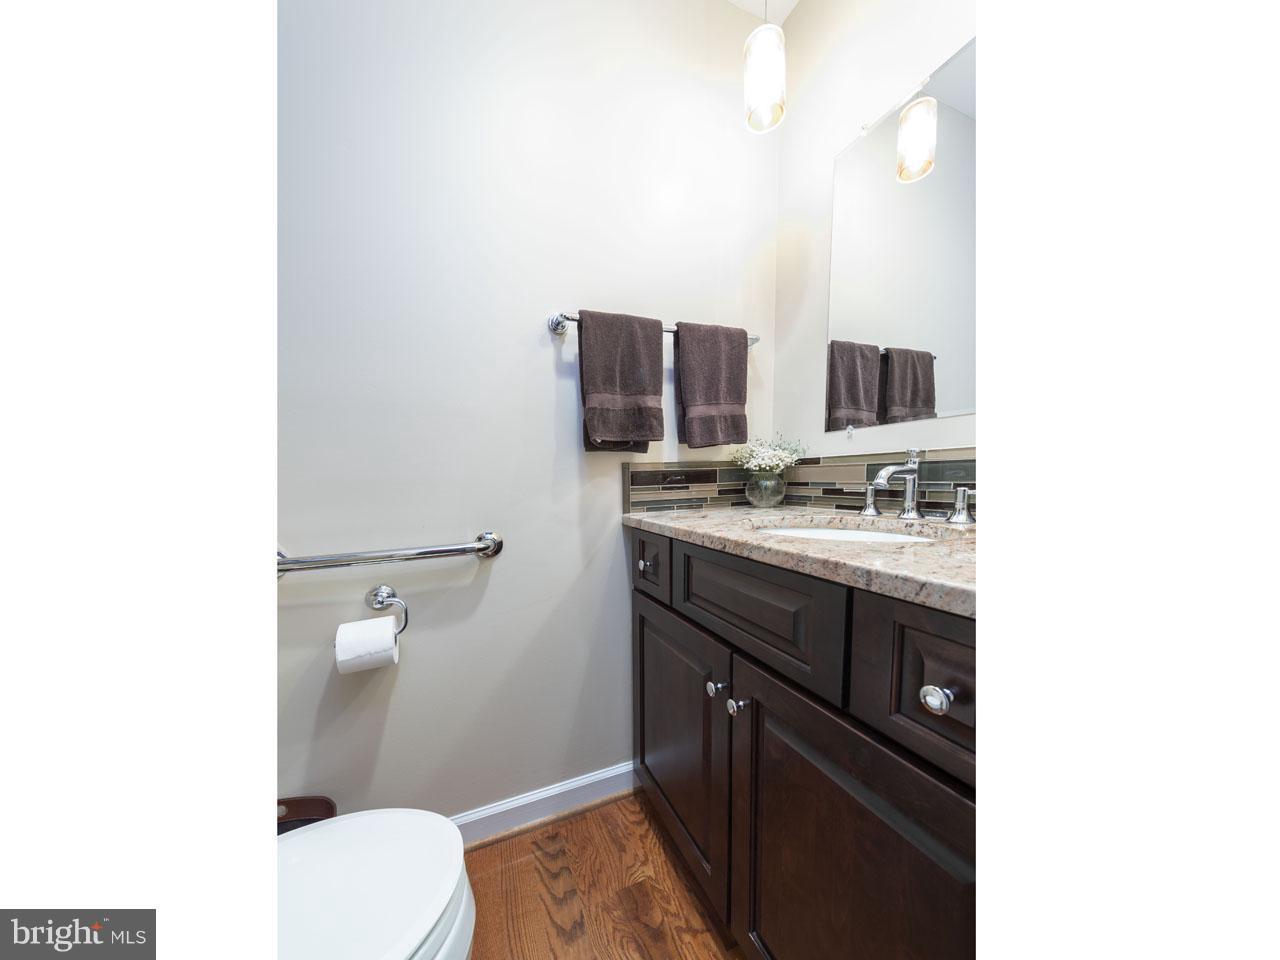 1006211278-300688039613-2021-07-22-07-39-39        Burke Delaware Real Estate For Sale   MLS# 1006211278  - Best of Northern Virginia